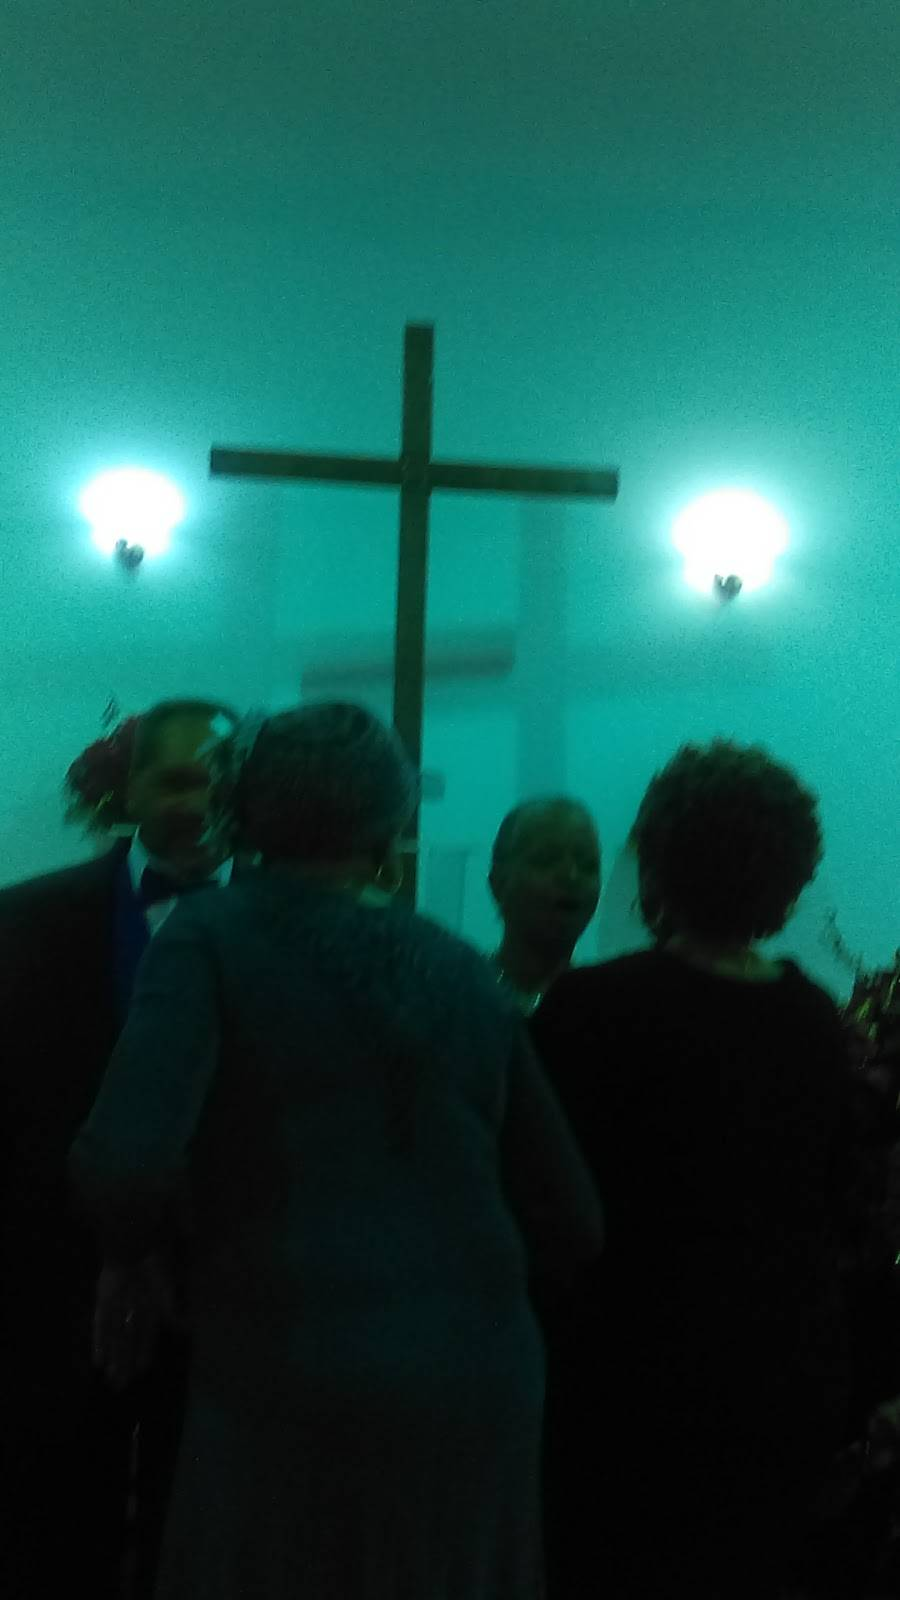 The Shiloh Christian Community Church - church  | Photo 6 of 8 | Address: 825 Yale Ave, Baltimore, MD 21229, USA | Phone: (410) 368-6002